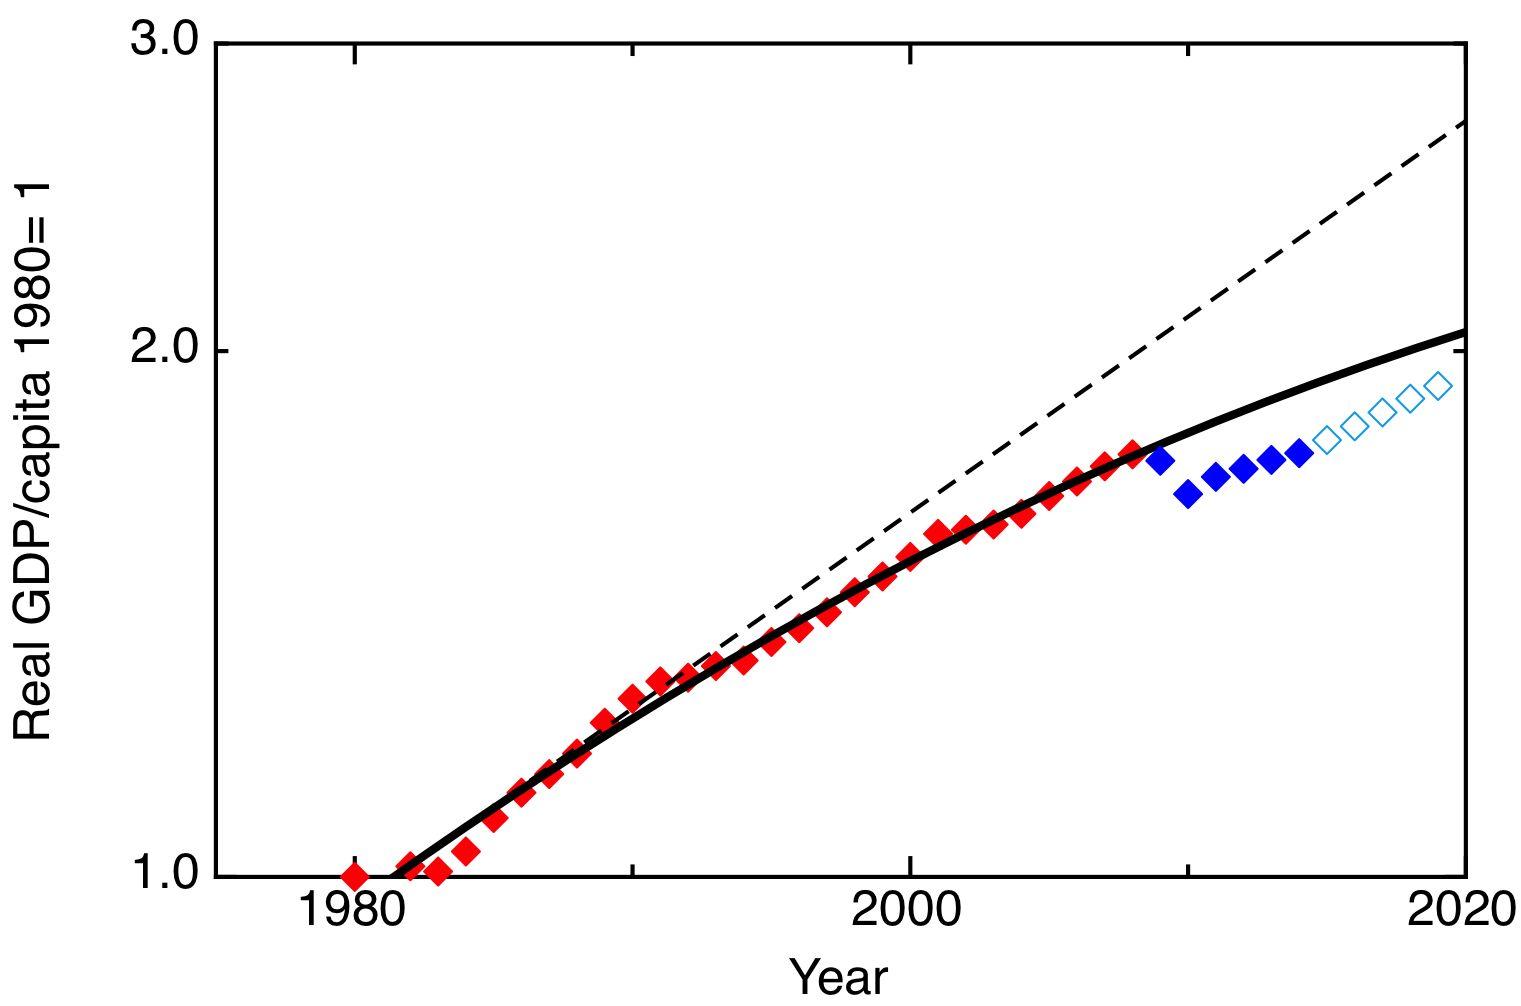 http://www.softmachines.org/wordpress/wp-content/uploads/2014/05/G7-Real-GDP-per-capita-plot.jpg